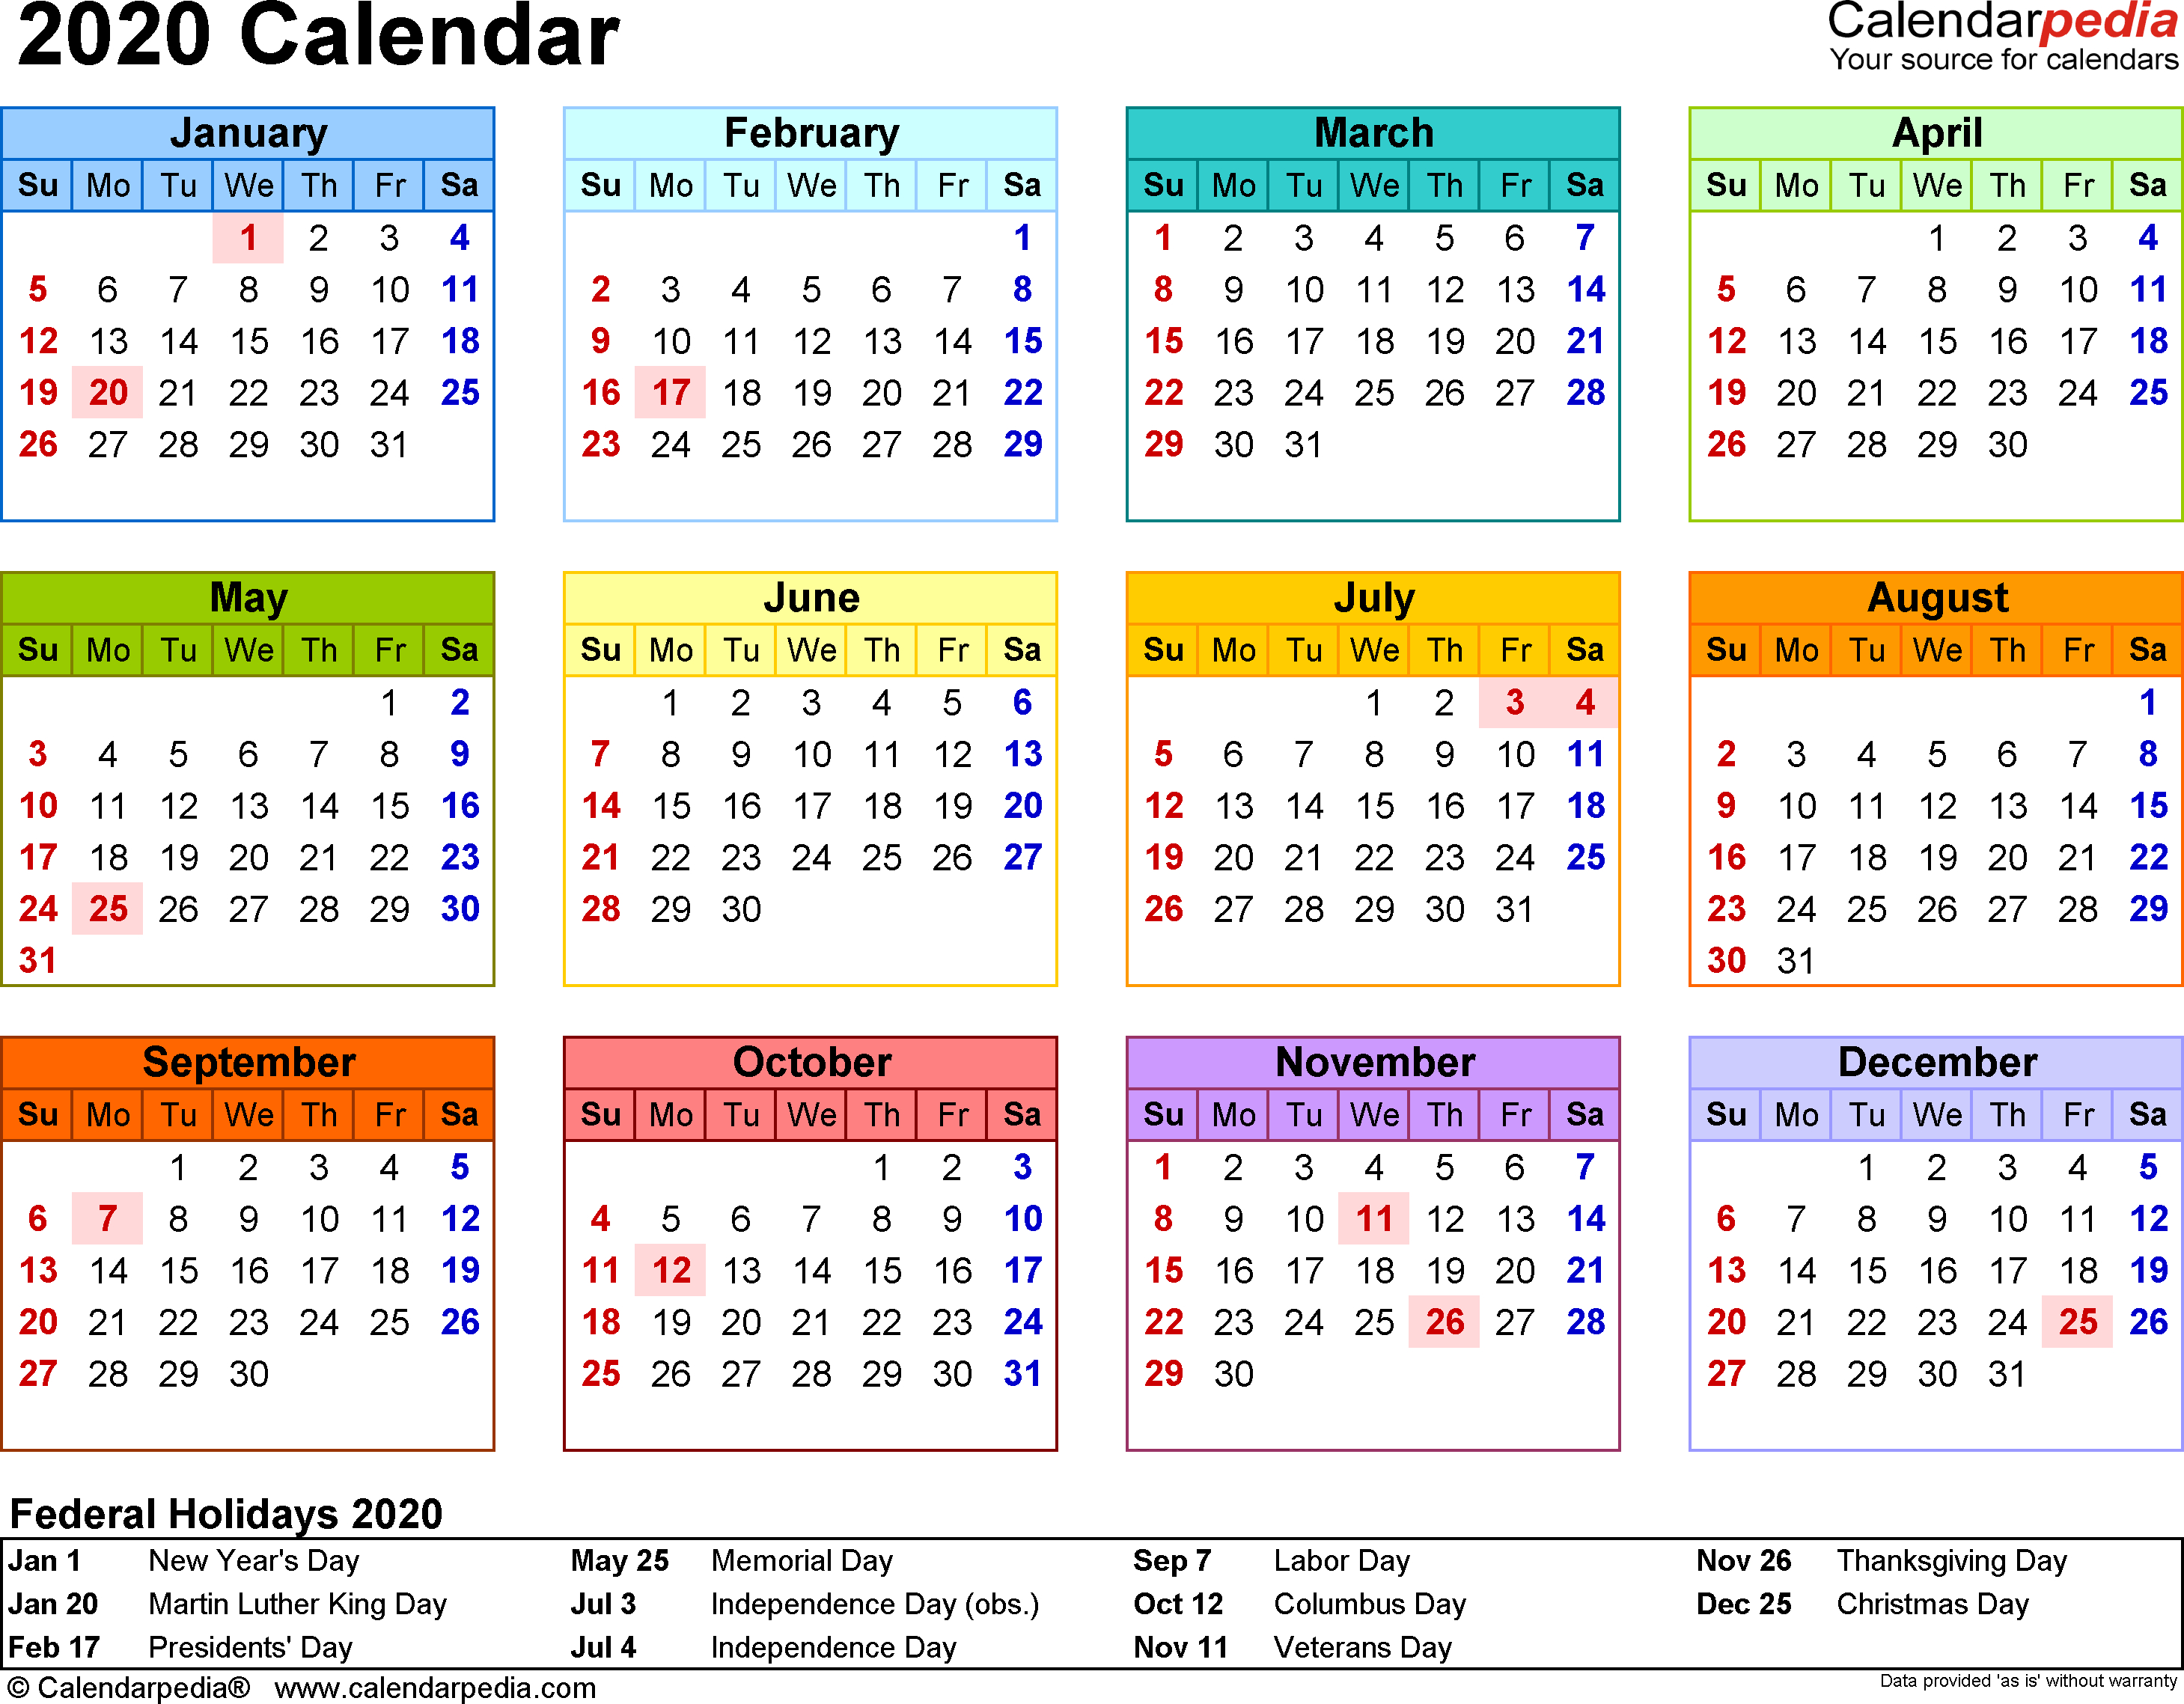 2020 Calendar - 17 Free Printable Word Calendar Templates pertaining to 2020 Printable Calendar Templates Quarterly